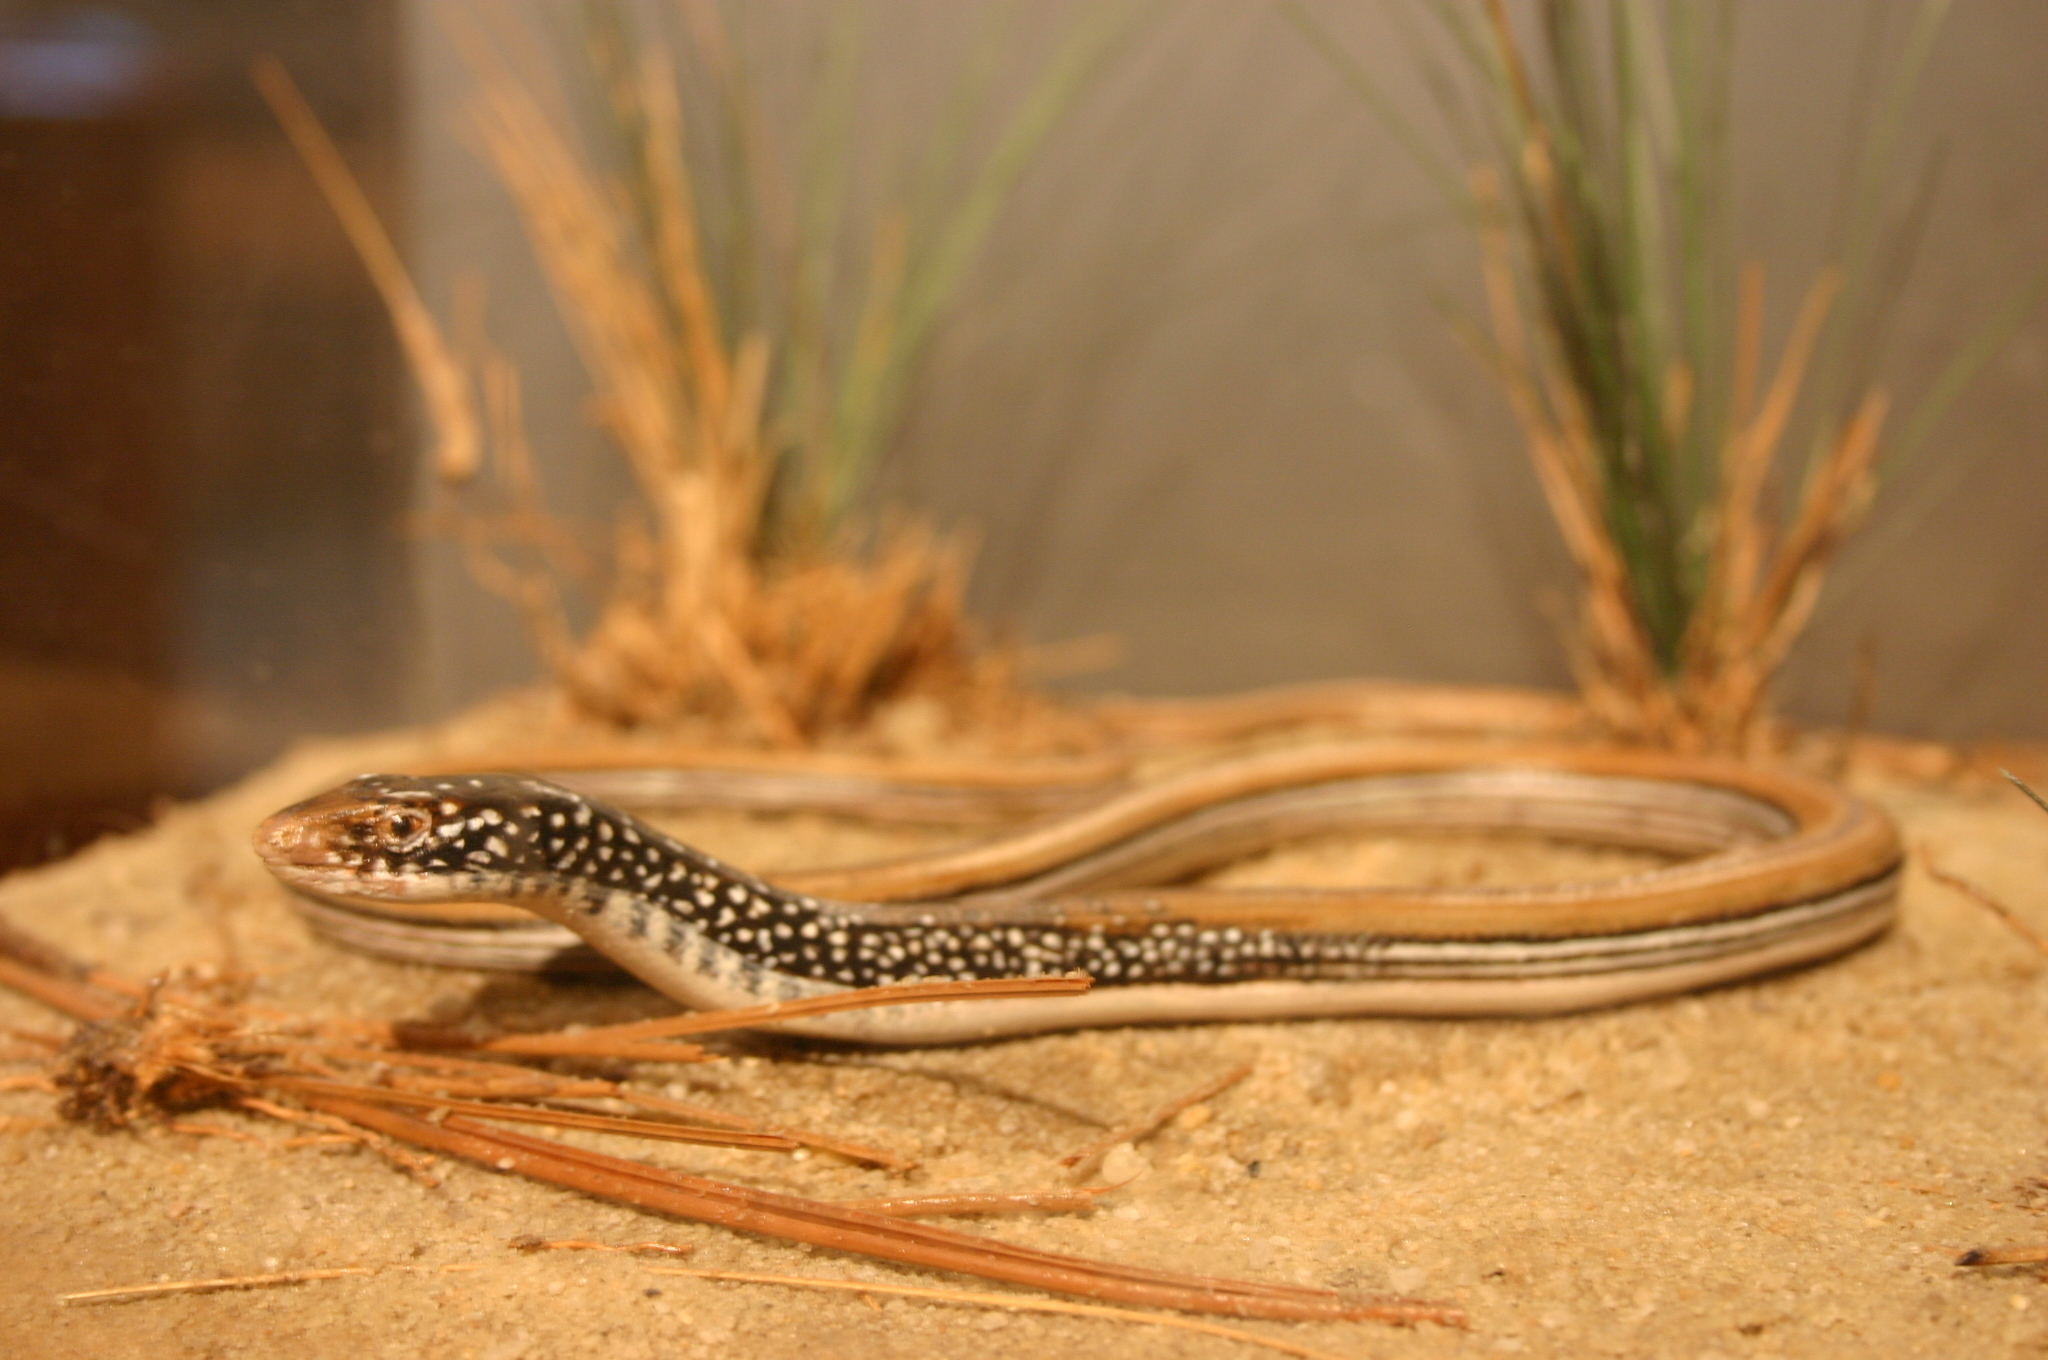 Image of Mimic Glass Lizard